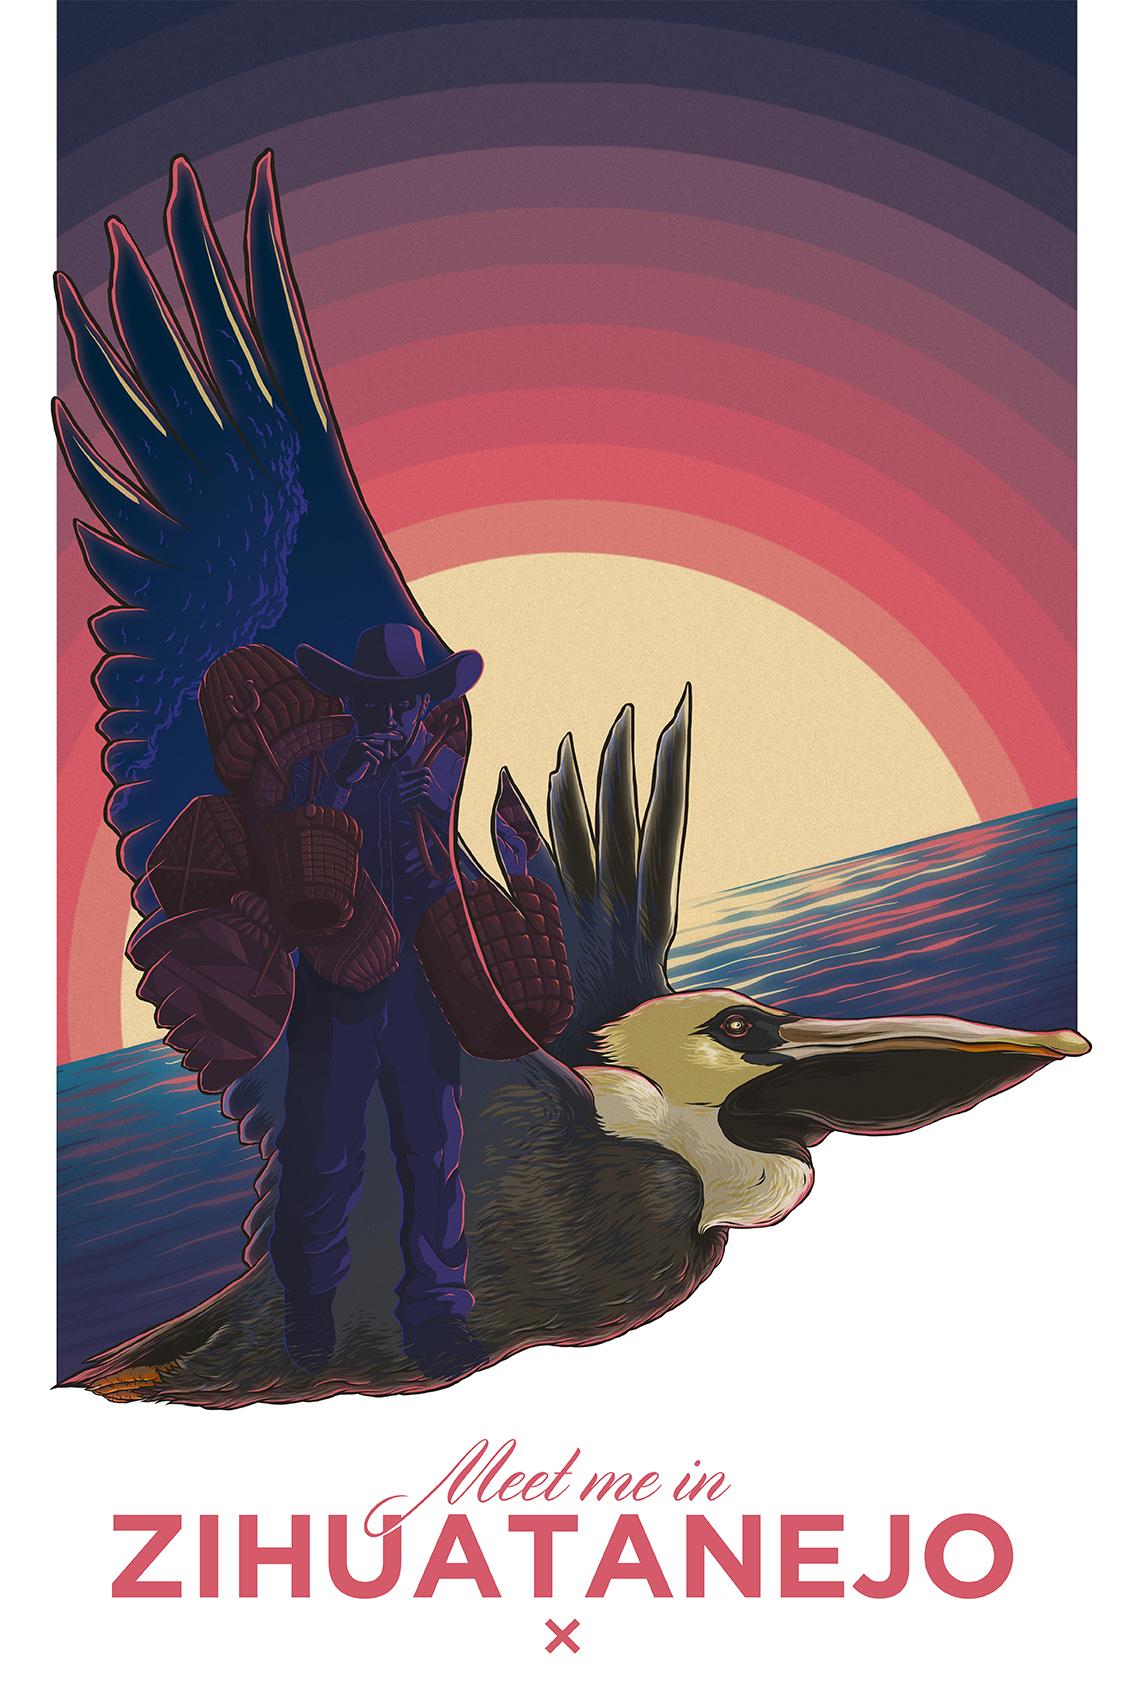 PelicanoArtesano_Zihuatanejo_lowRes.jpg